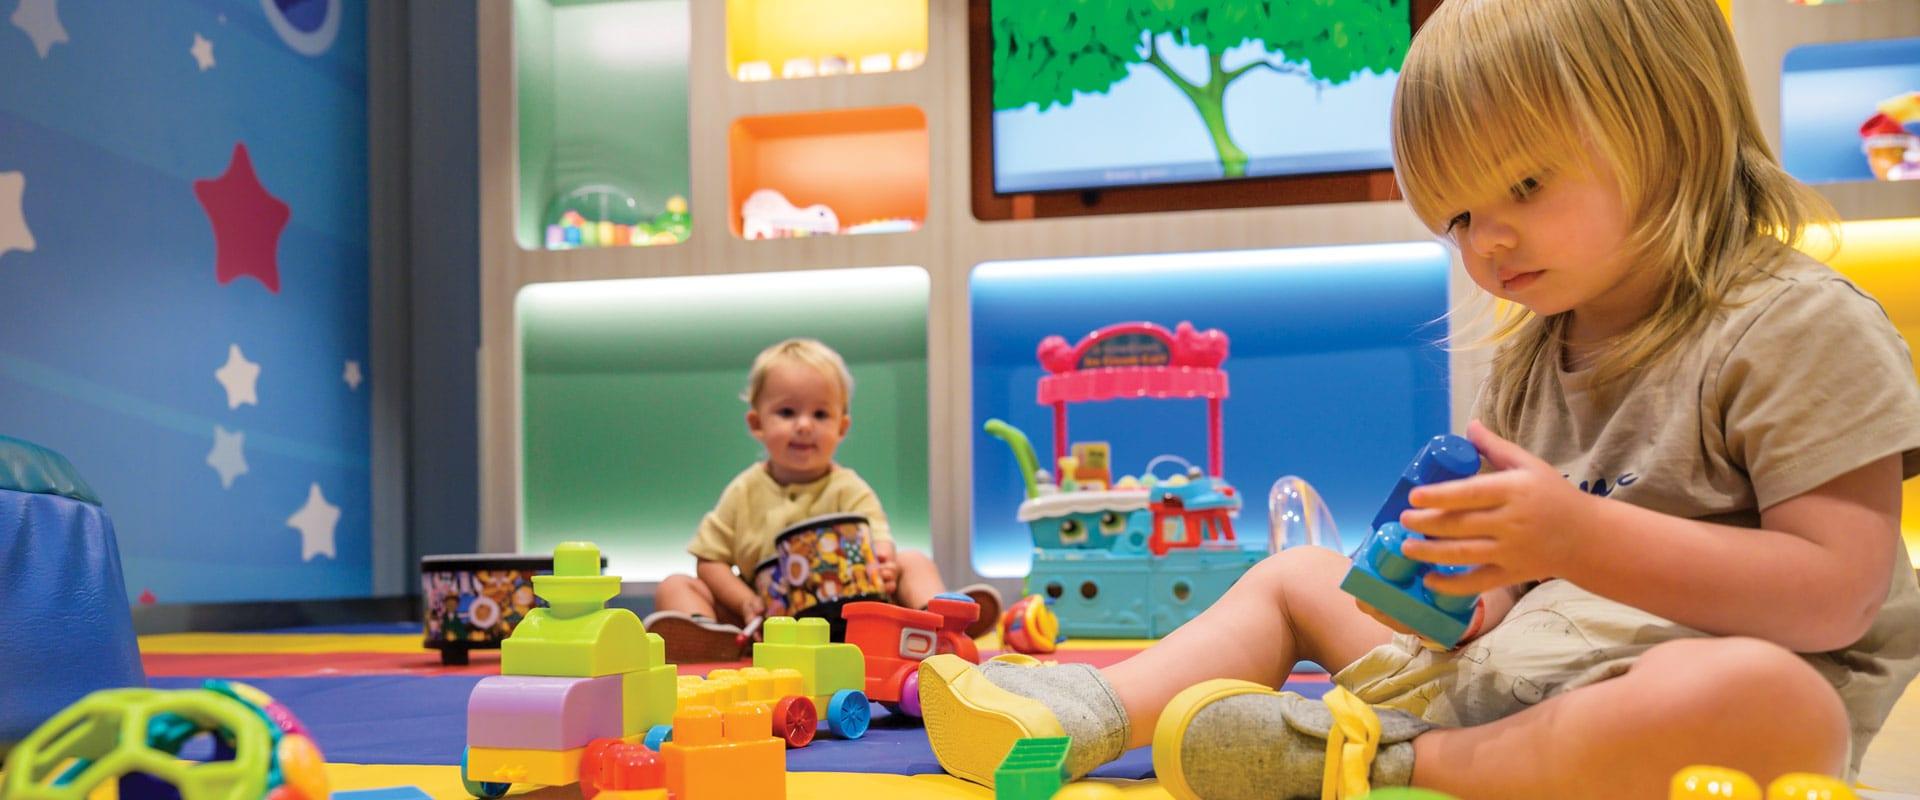 Do Cruise Ships allow Babies?